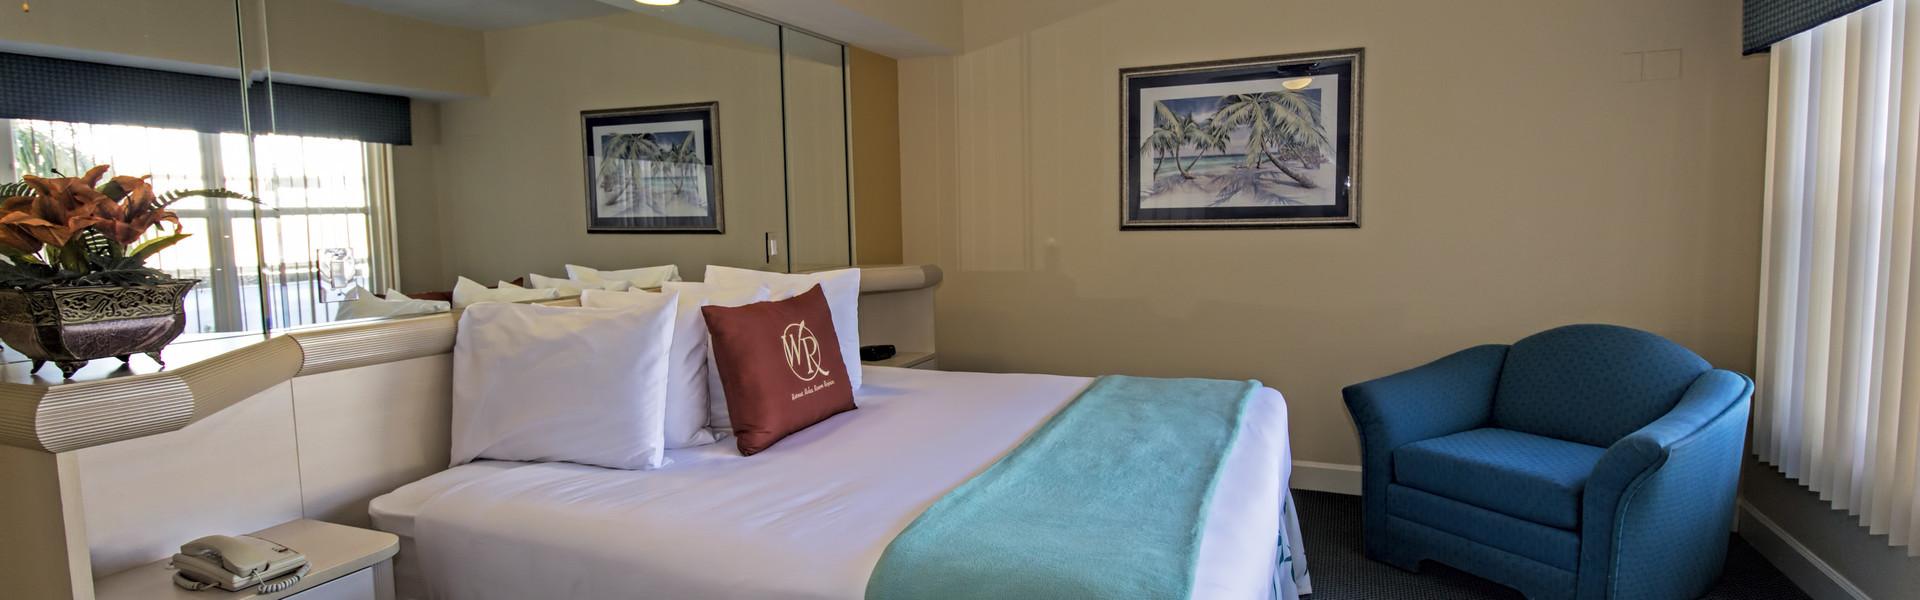 https://gc.synxis.com/rez.aspx?hotel=68762&Chain=19007